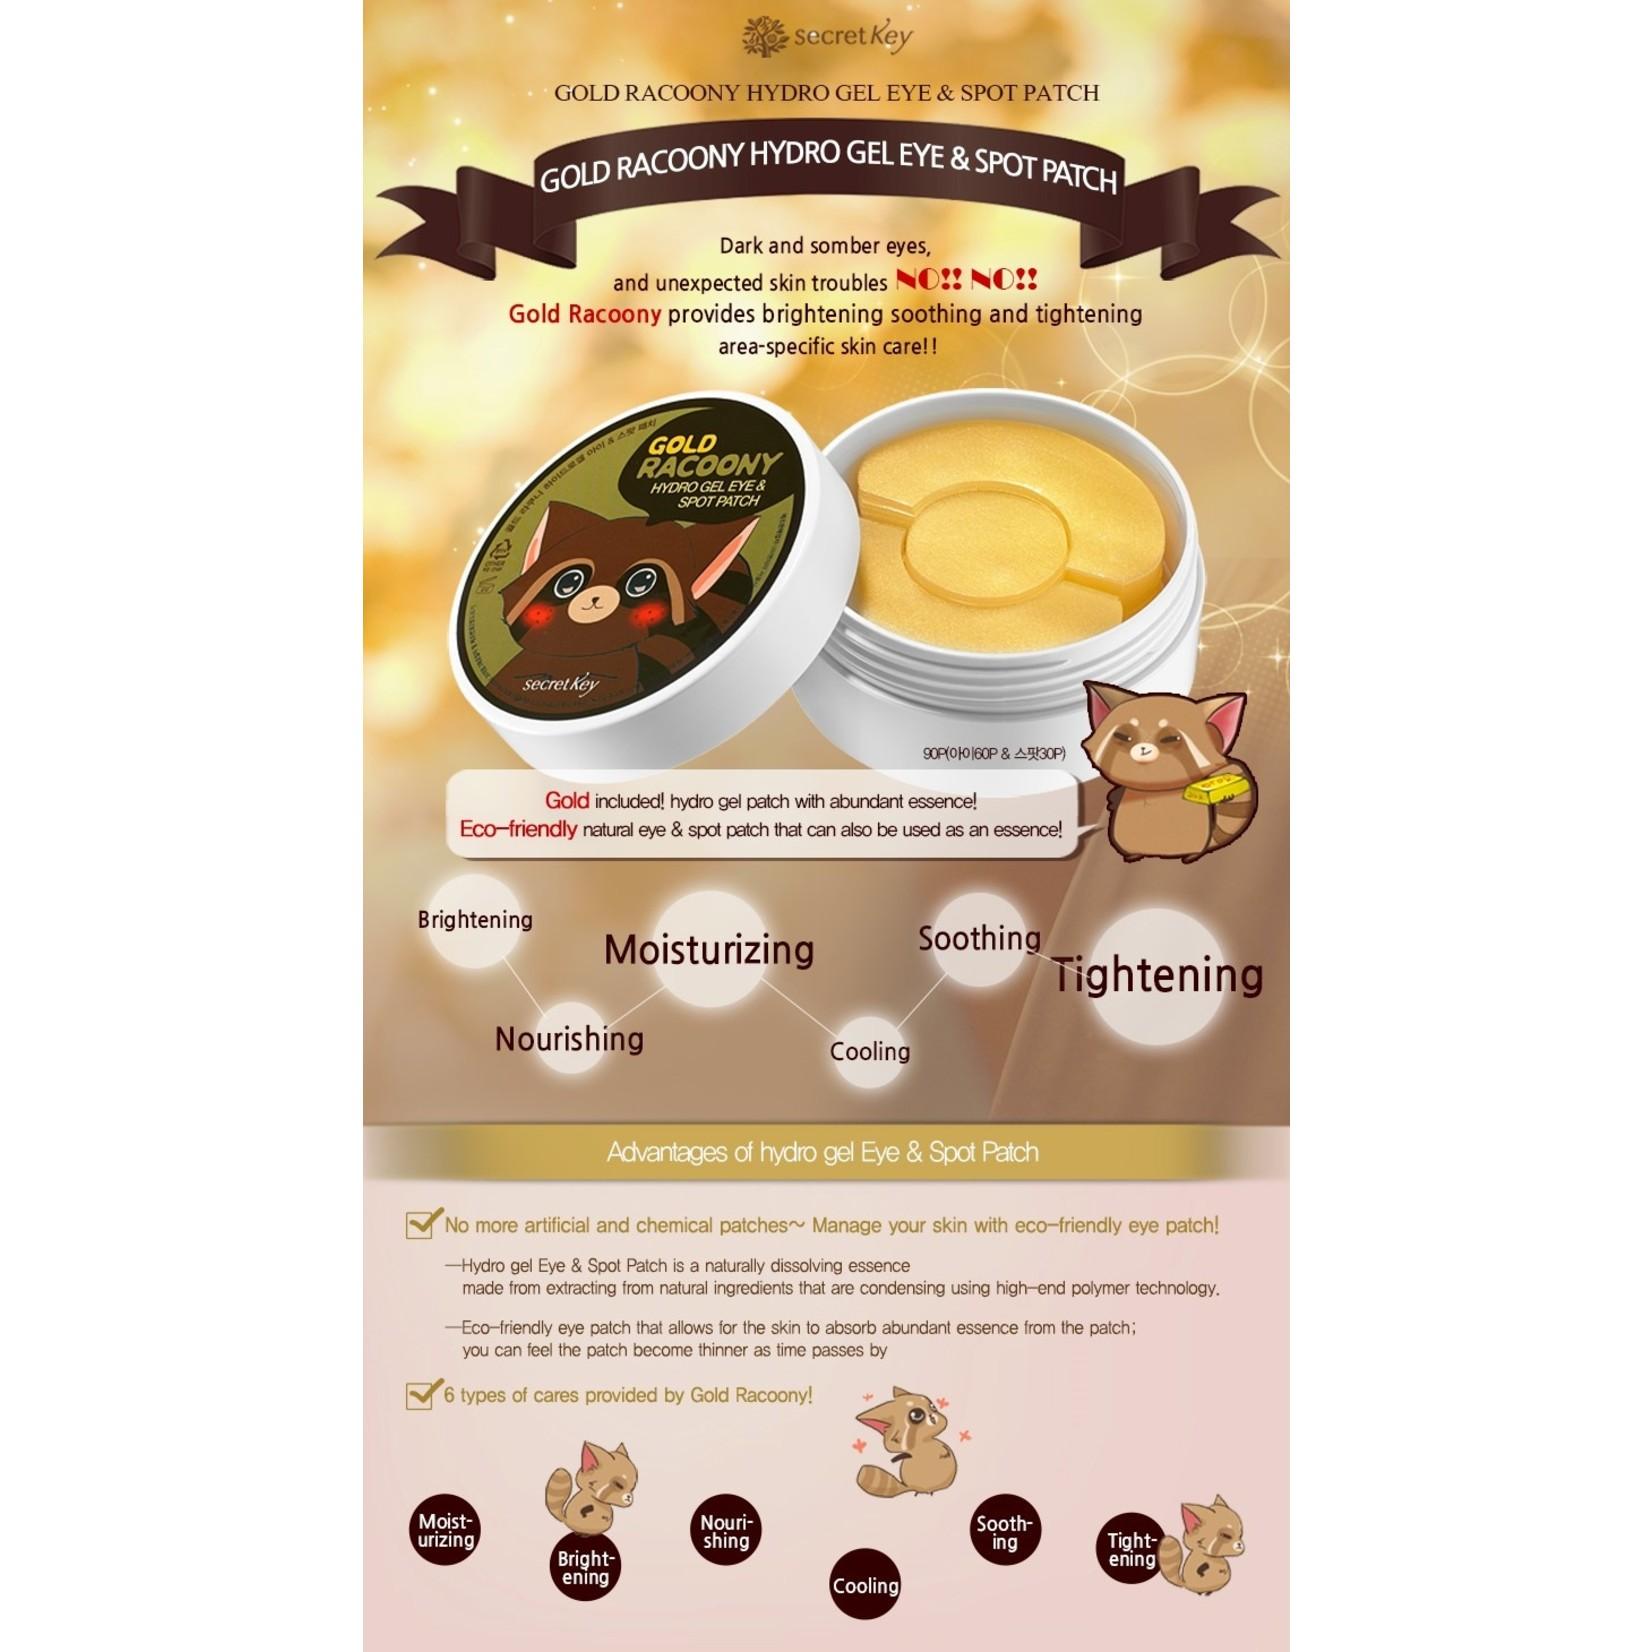 Secret Key Gold Racoony Hydrogel Eye & Spot Patch